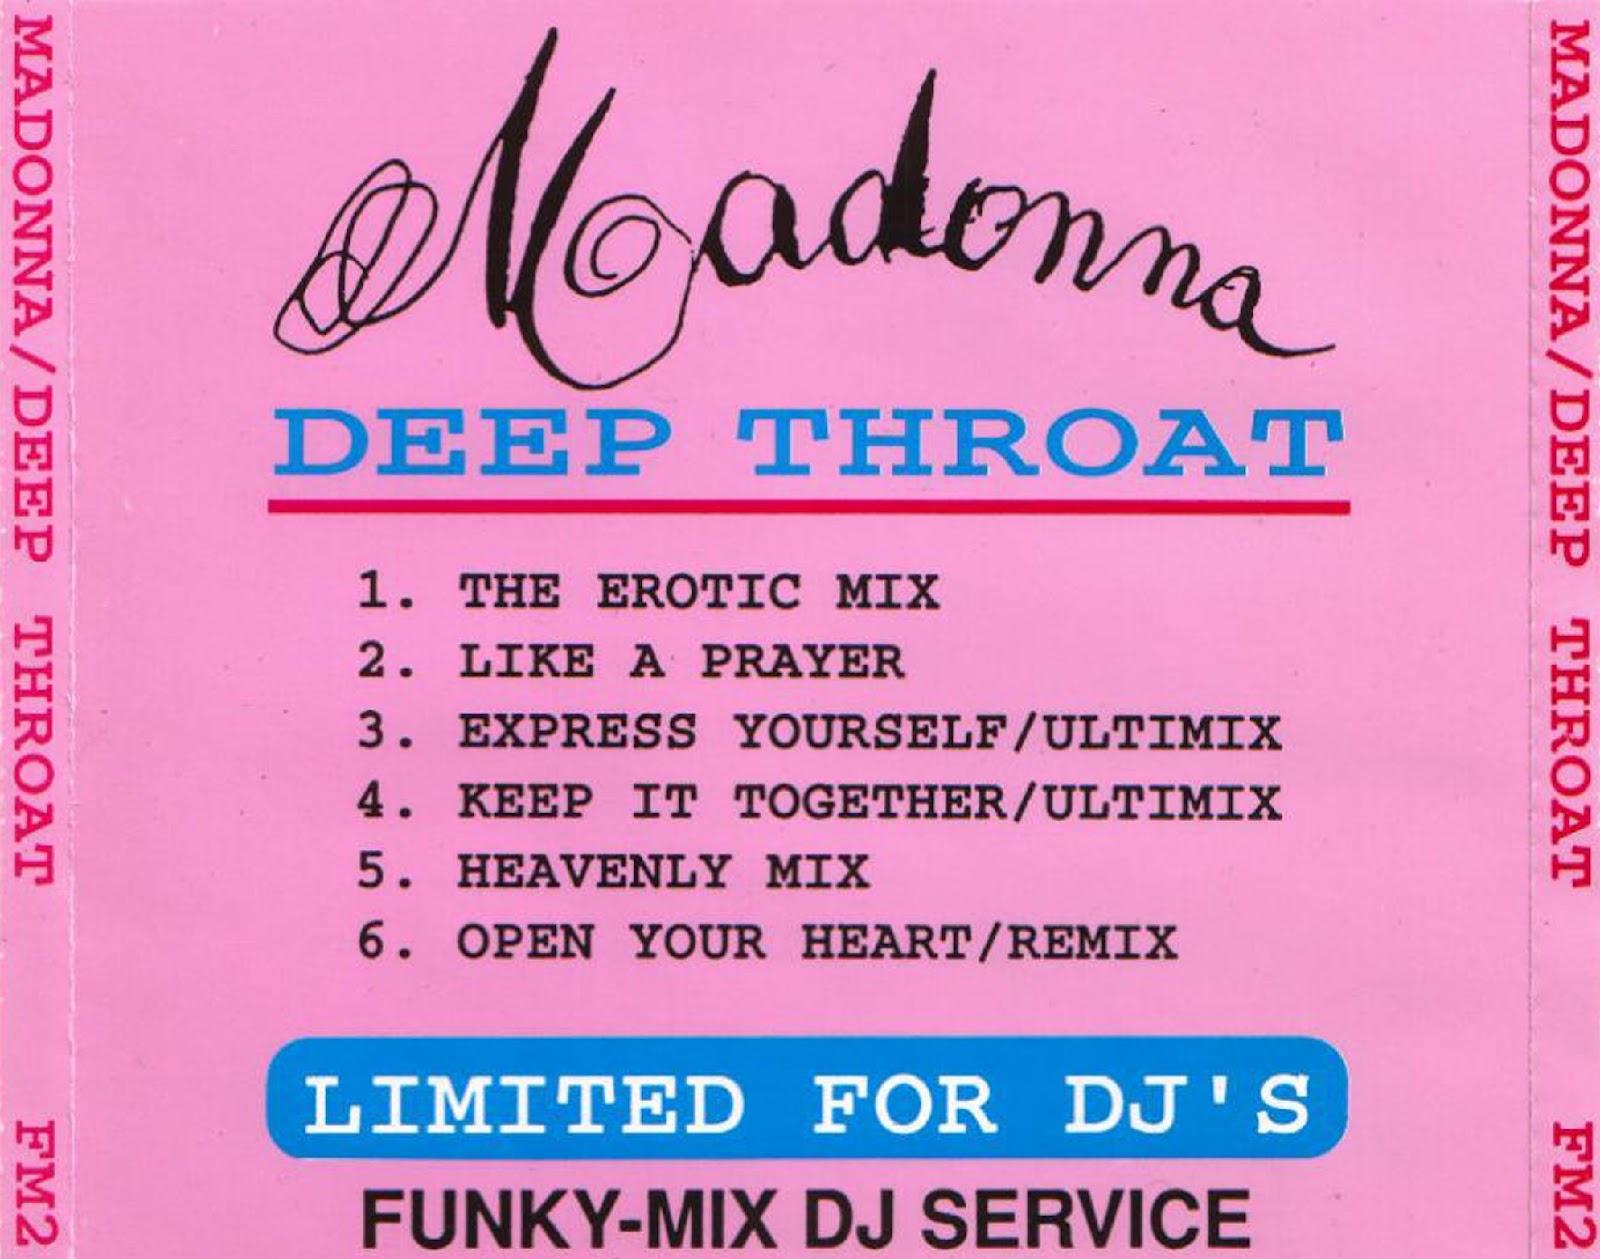 http://1.bp.blogspot.com/-i_zp03pPKiQ/UErqmdme_3I/AAAAAAAABYY/ZJMmRiXJdgE/s1600/00.+Deep+Throat+Vol.+I+B.jpg